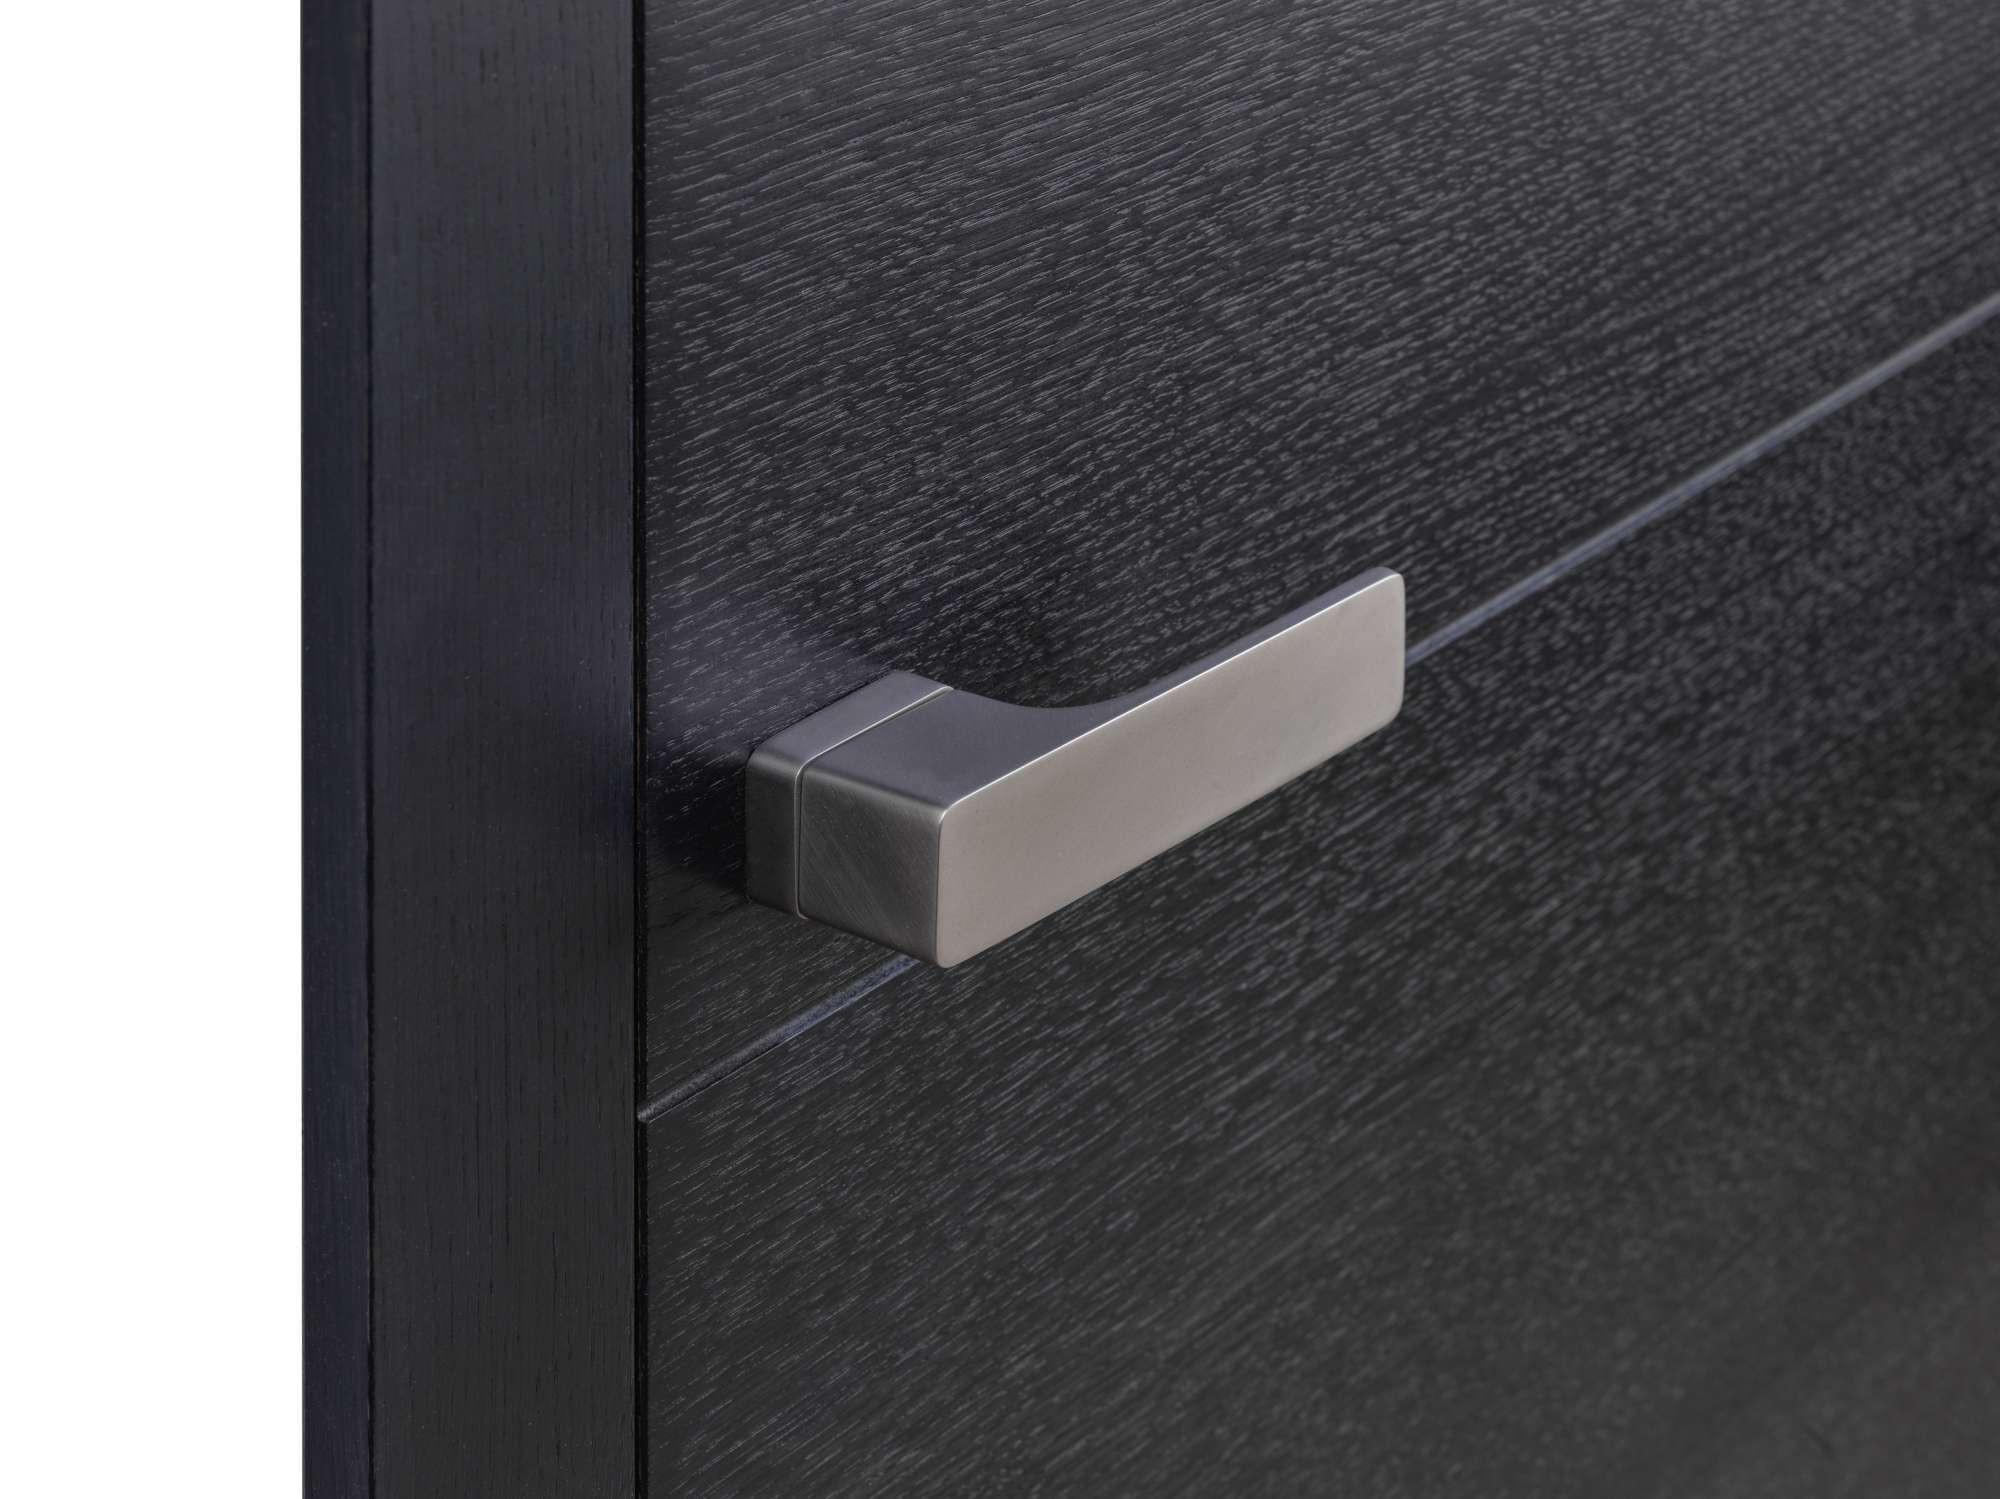 deurklink-zonder-sleutelrozas